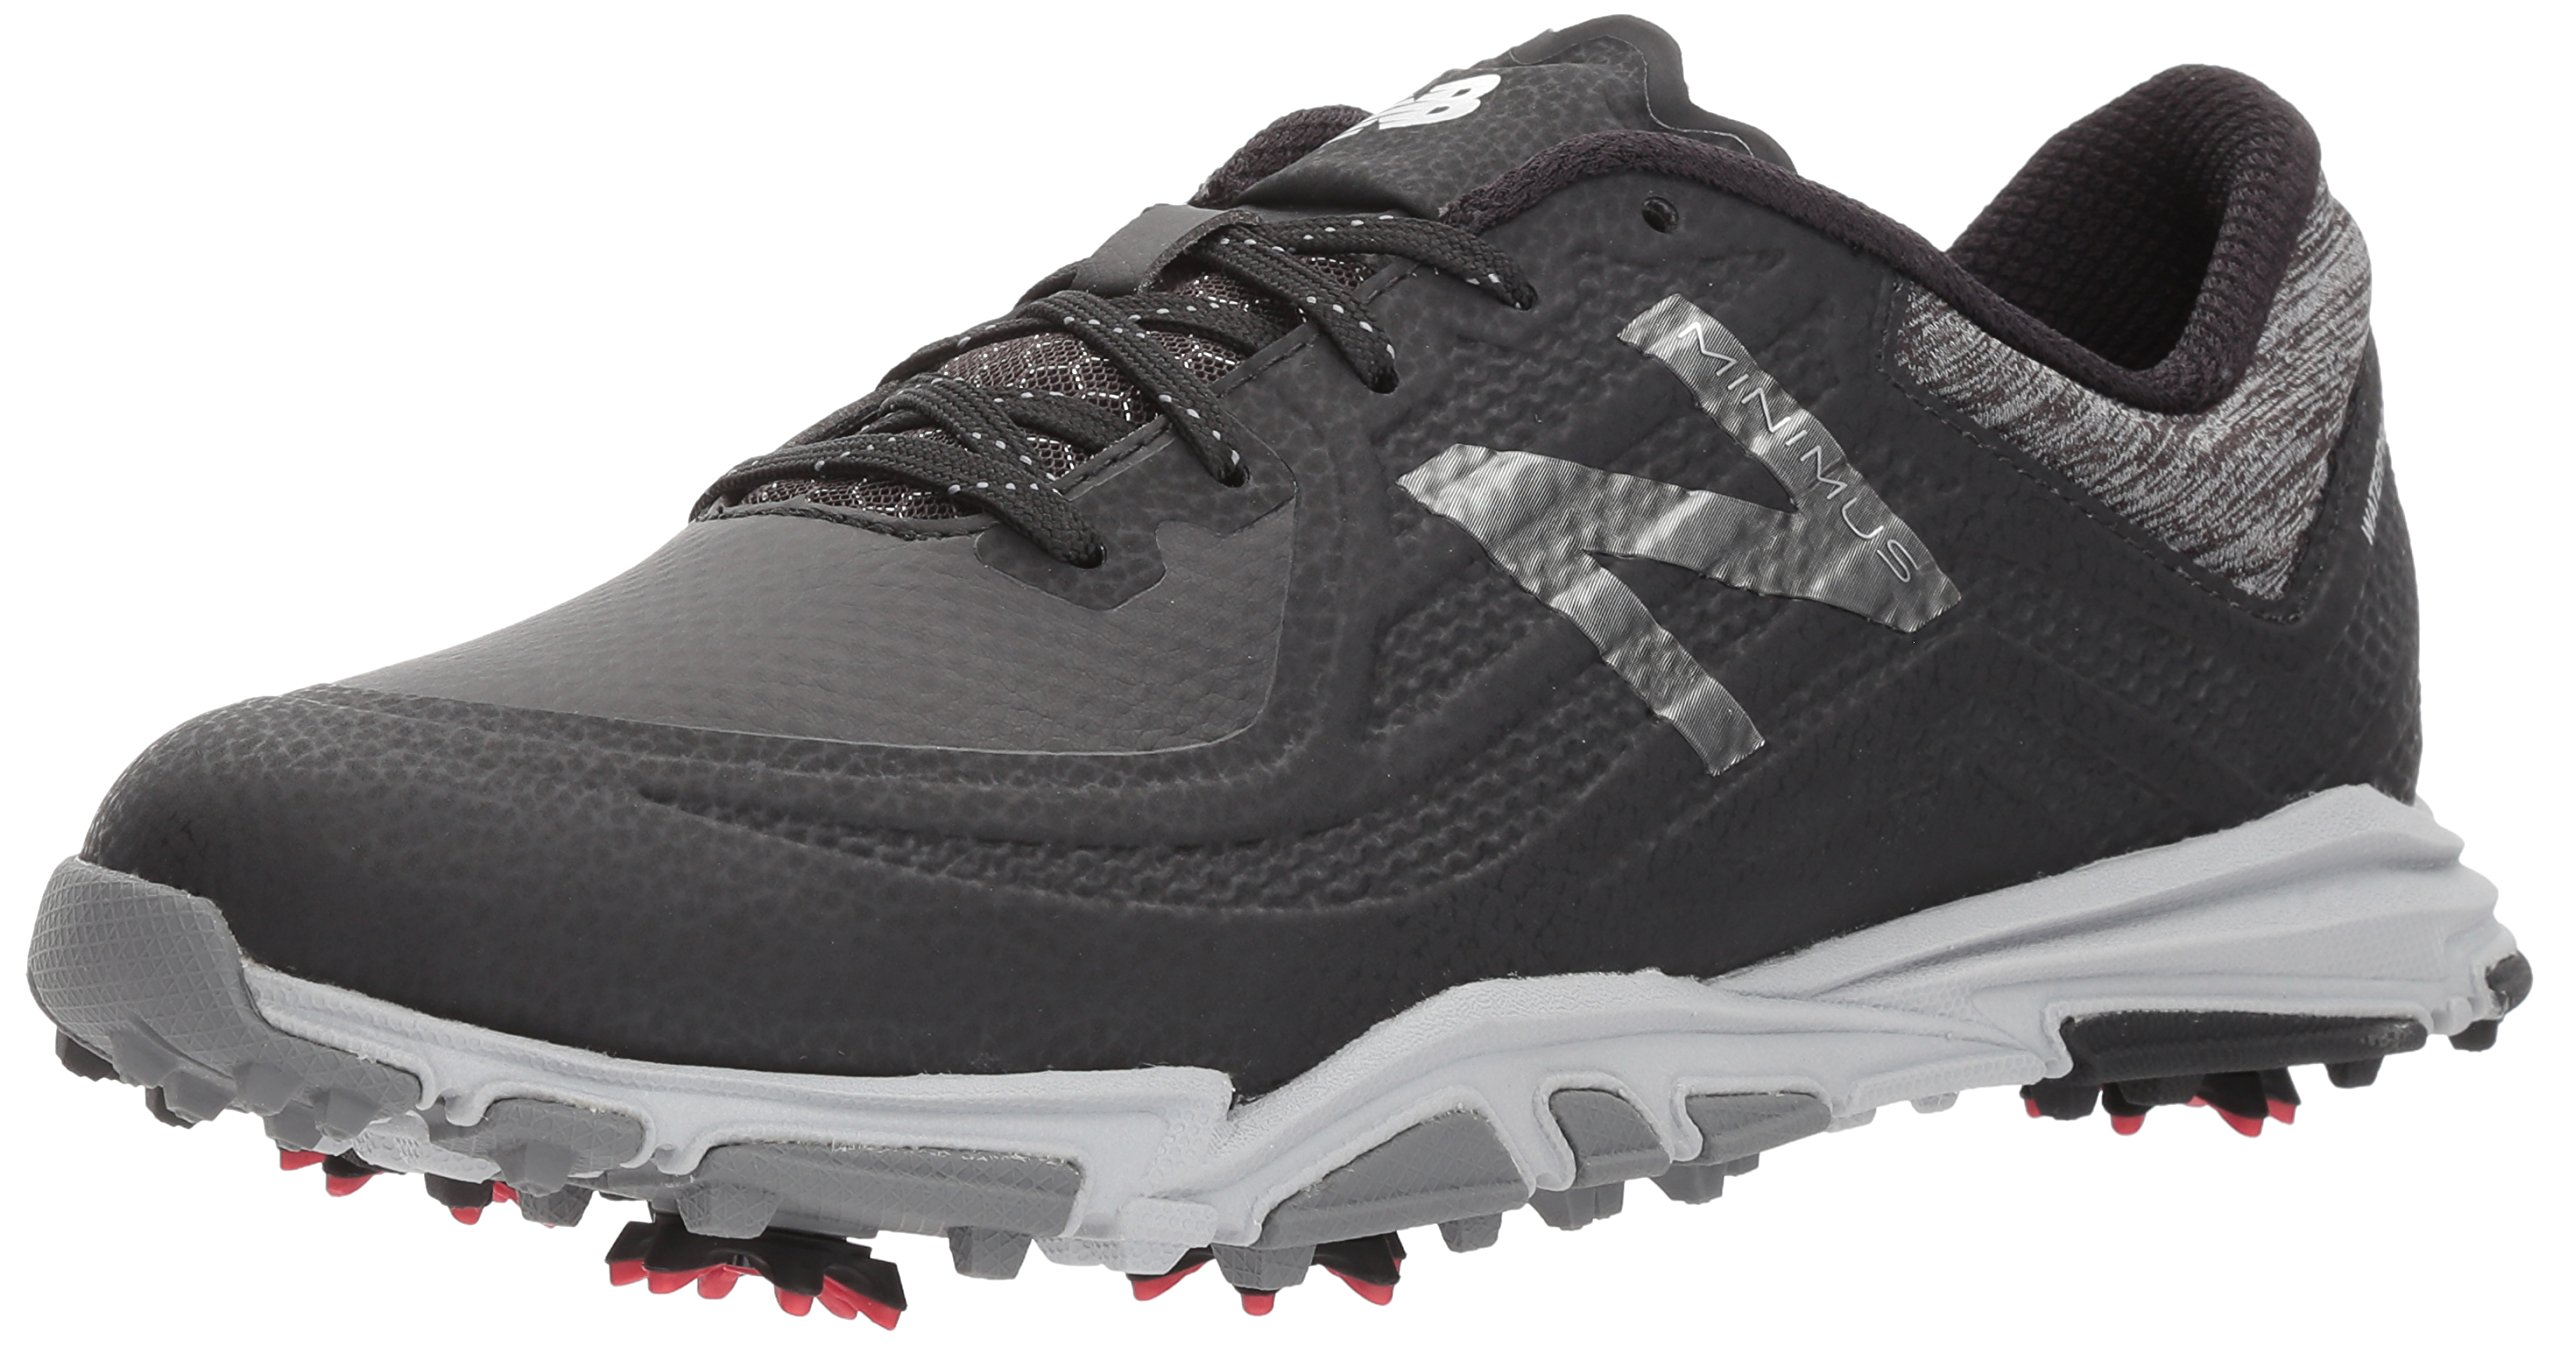 New Balance Men's Minimus Tour Golf Shoe, Black, 13 2E 2E US by New Balance